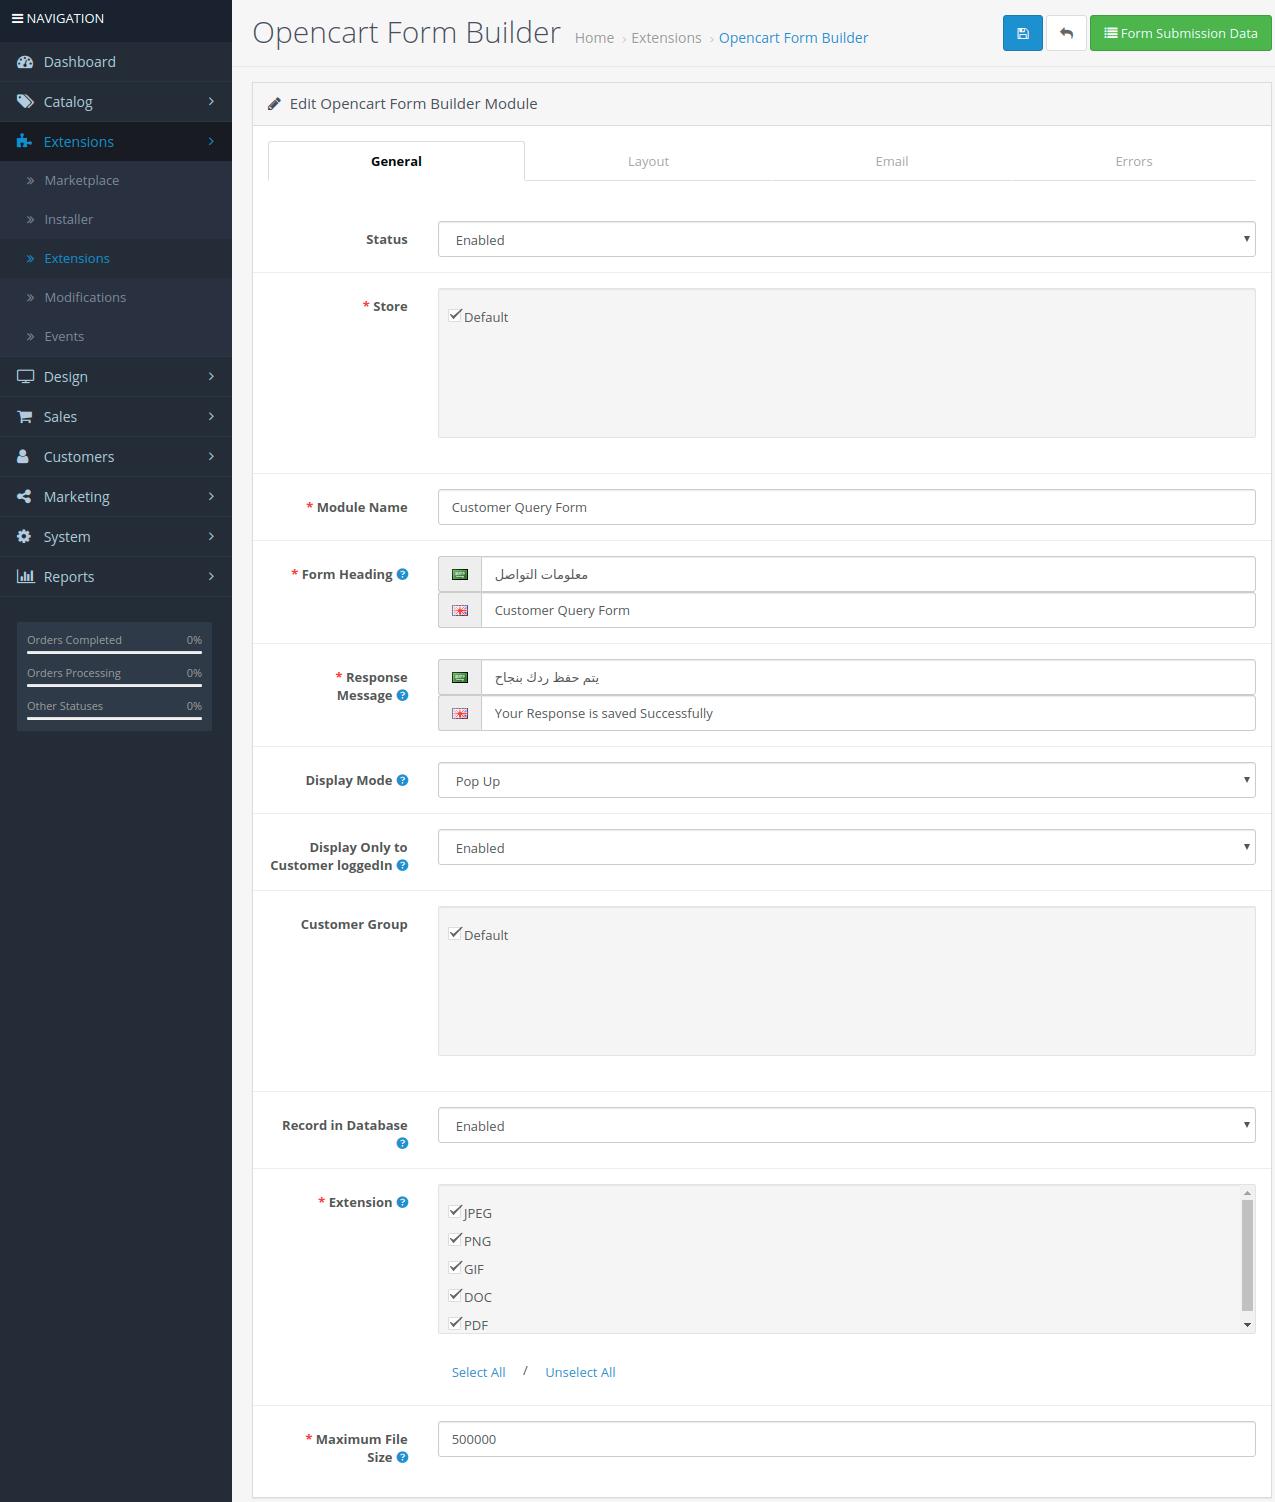 webkul_opencart-form-builder-Customer-_Query_Form